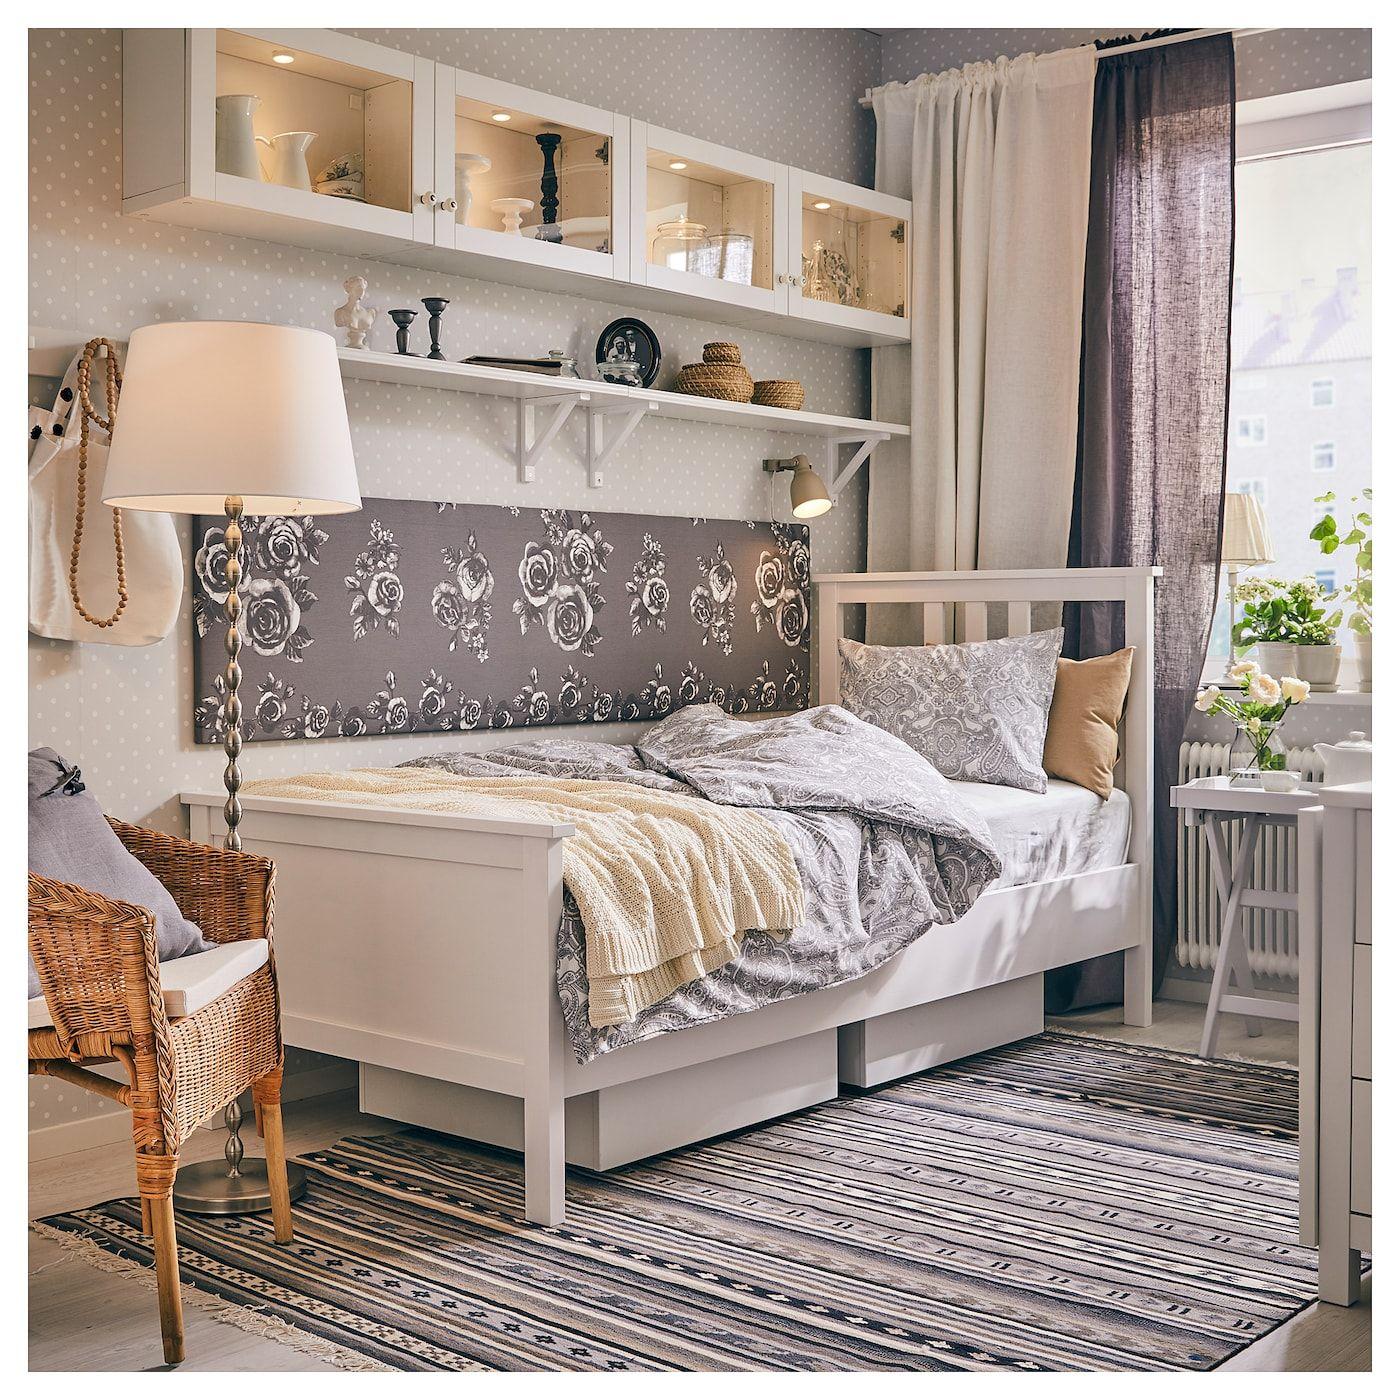 Hemnes Bettgestell Weiss Gebeizt Ikea Deutschland Hemnes Bed Bed Frame Ikea Hemnes Bed